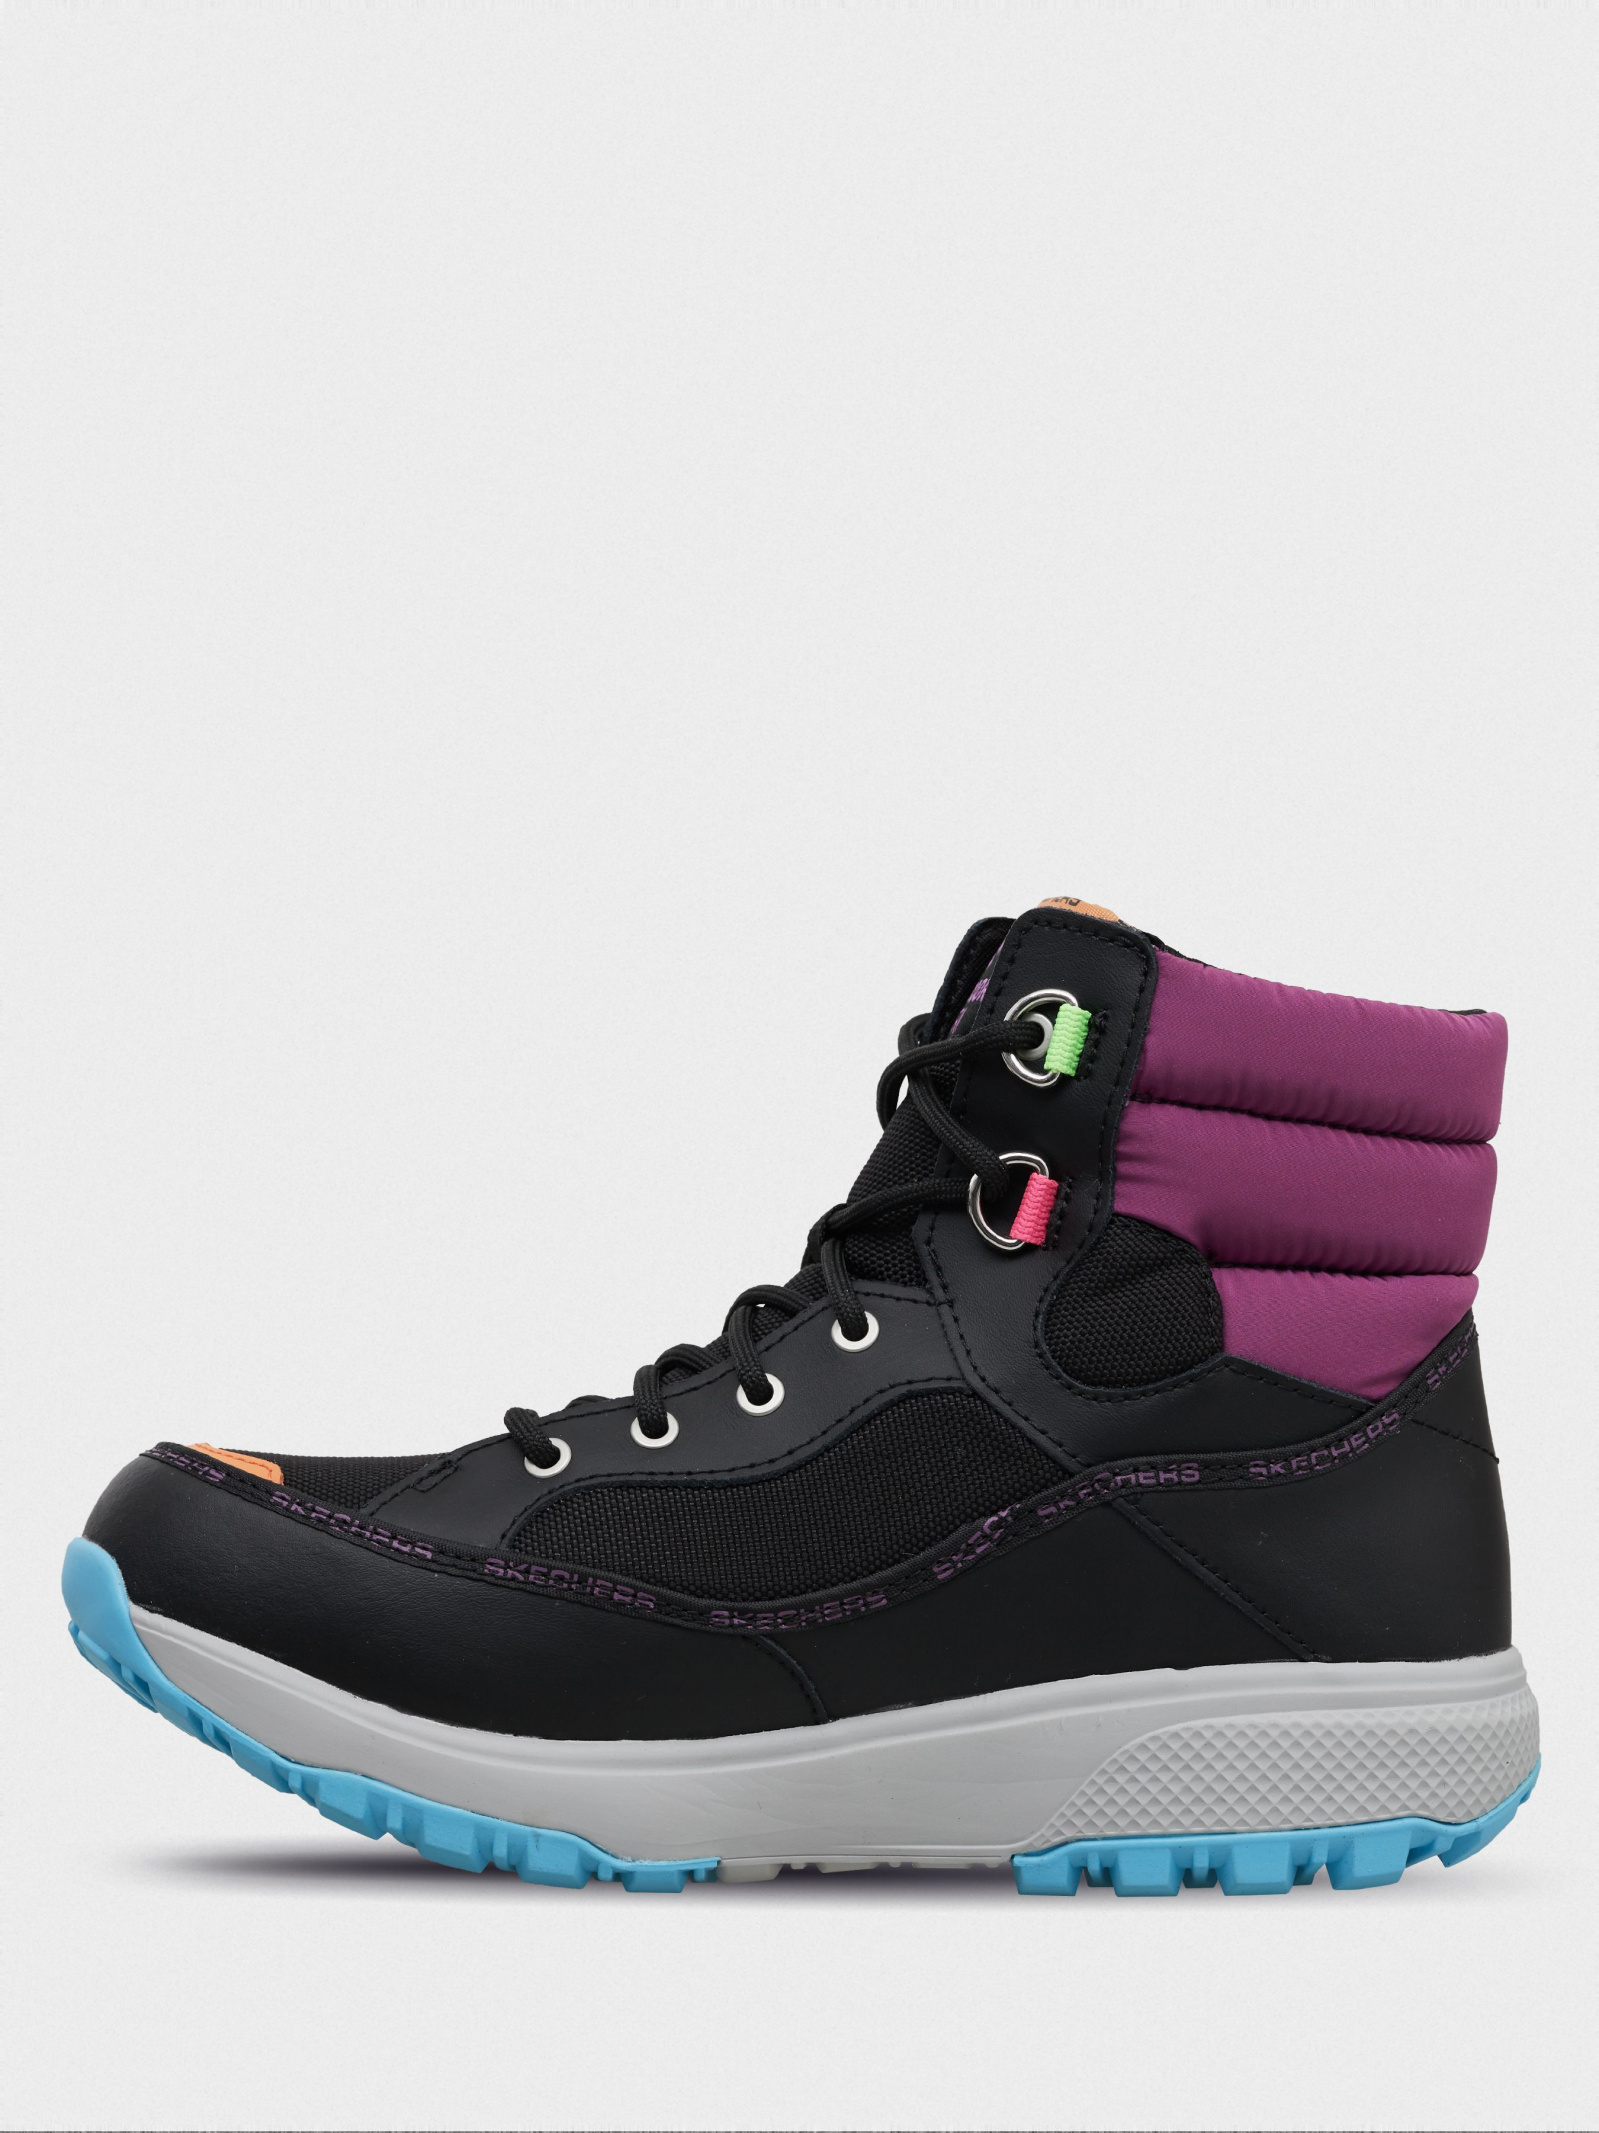 Ботинки для женщин Skechers KW5225 размеры обуви, 2017